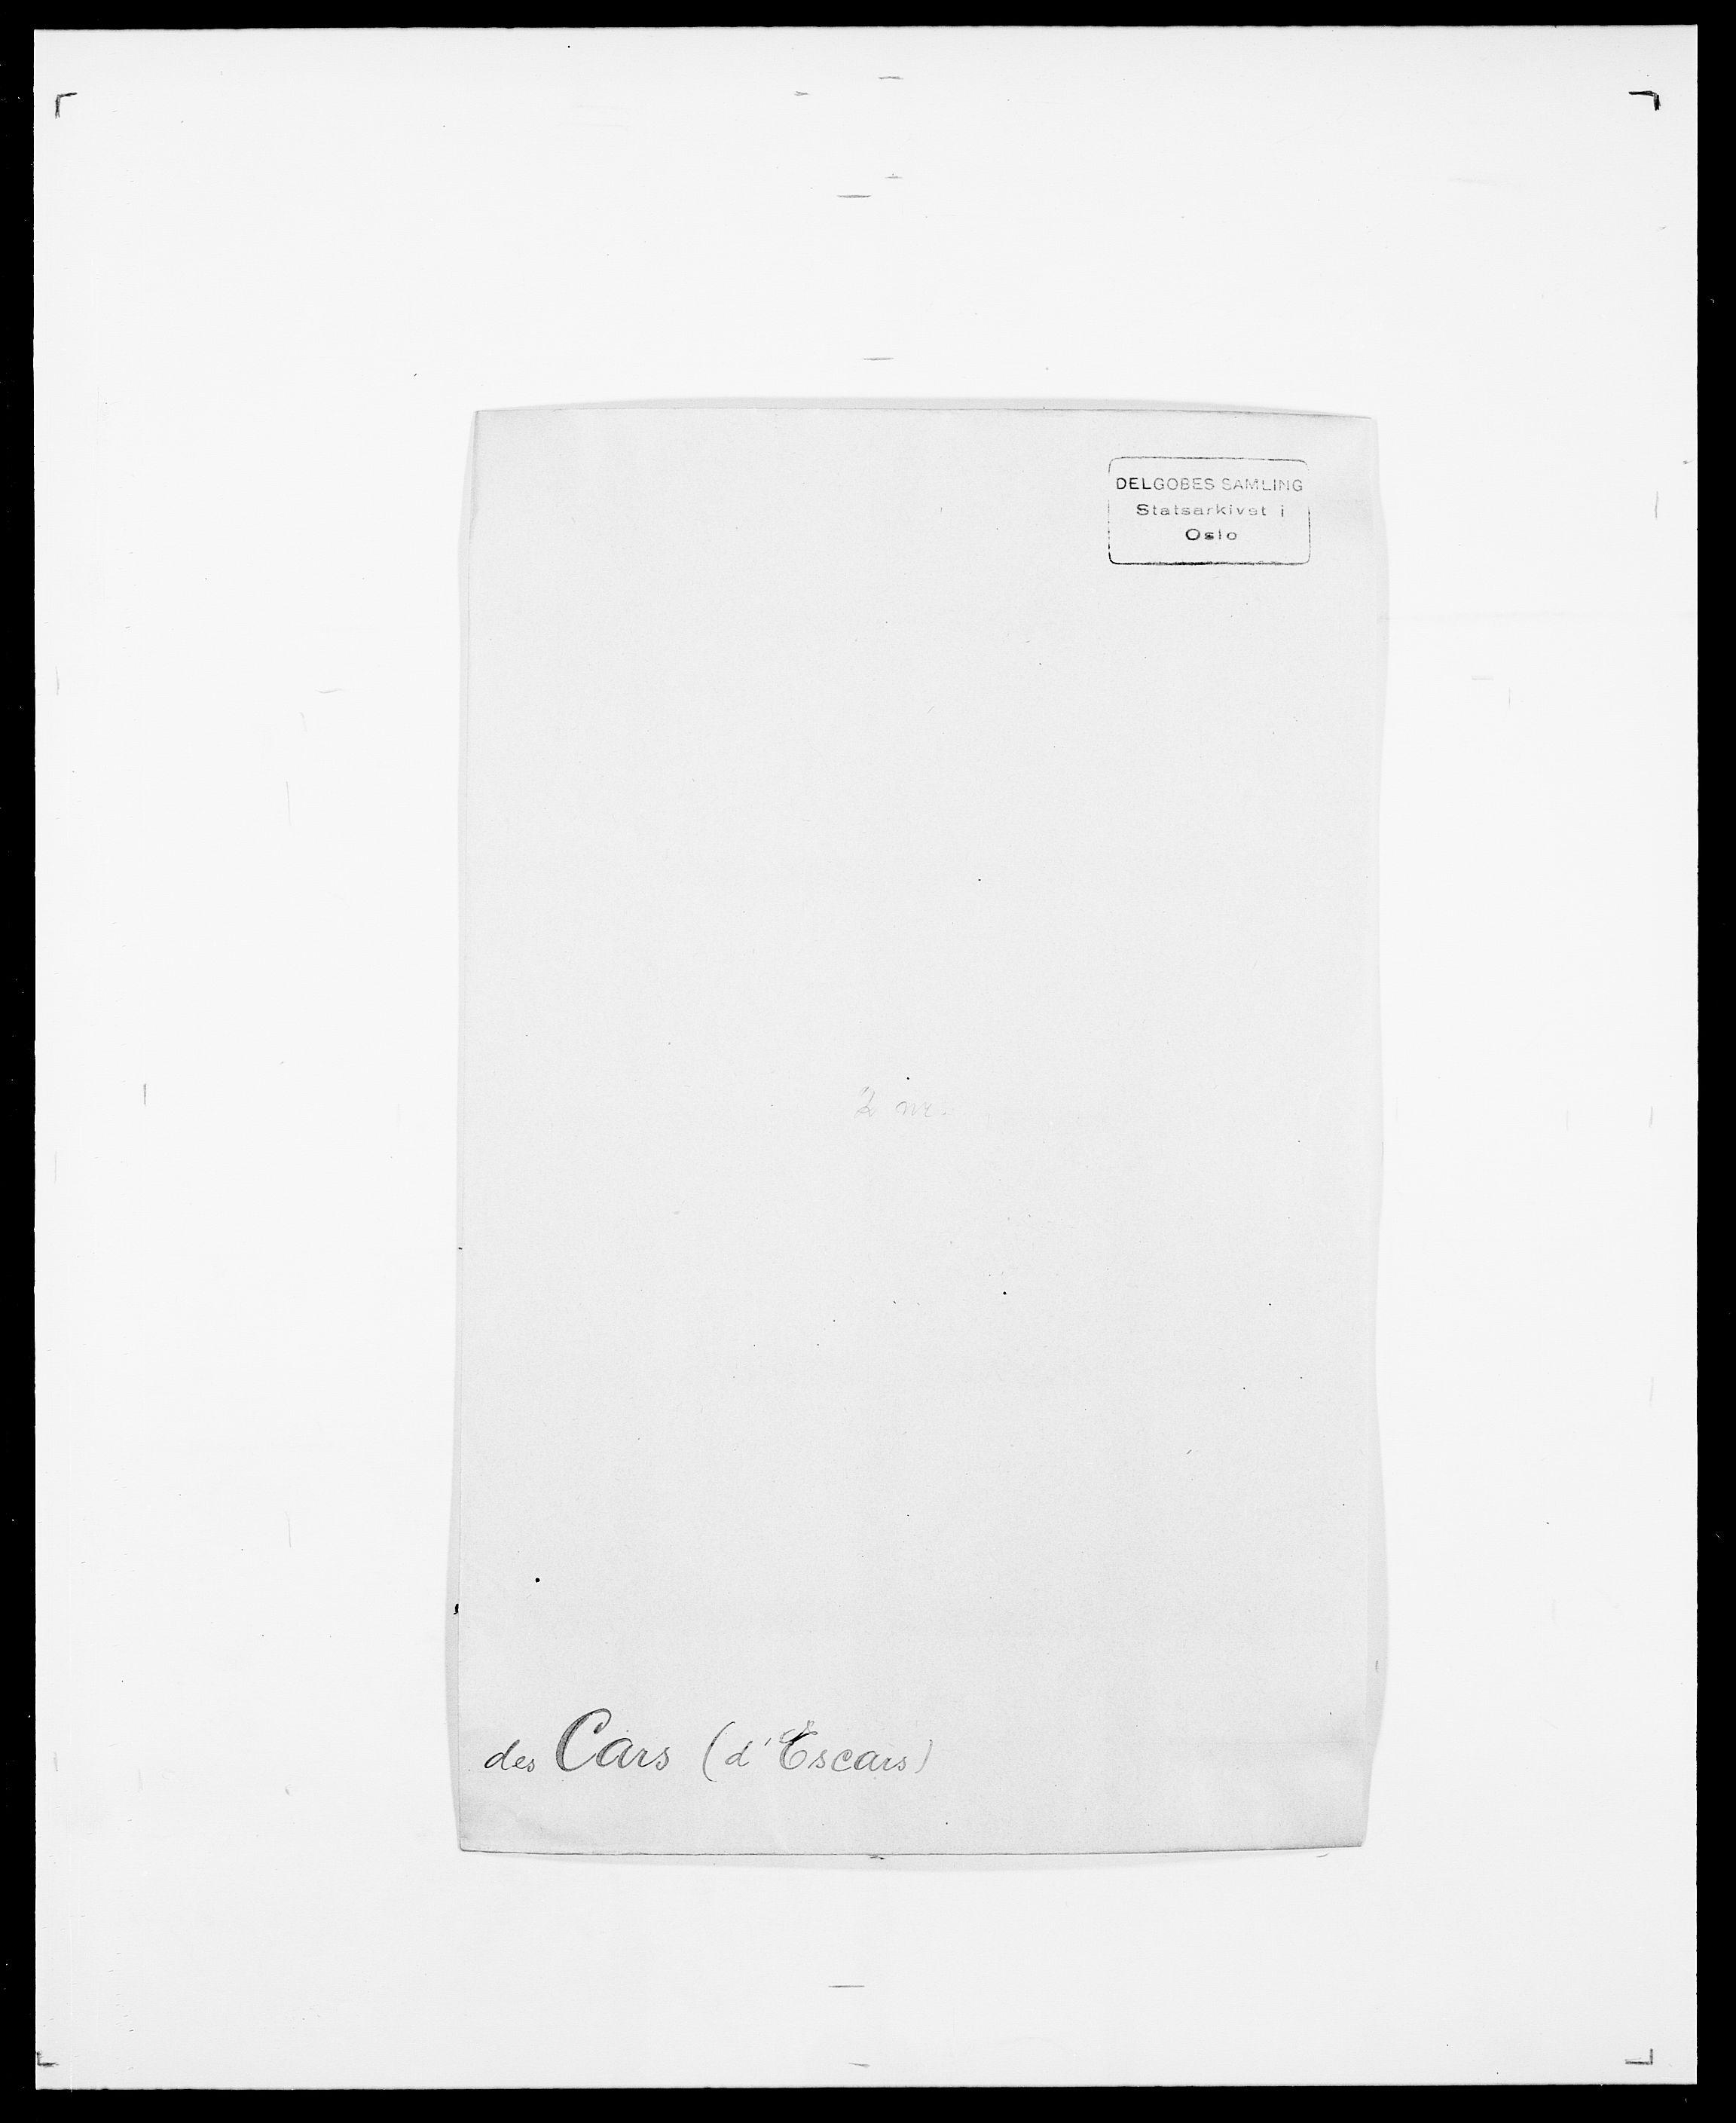 SAO, Delgobe, Charles Antoine - samling, D/Da/L0008: Capjon - Dagenbolt, s. 85